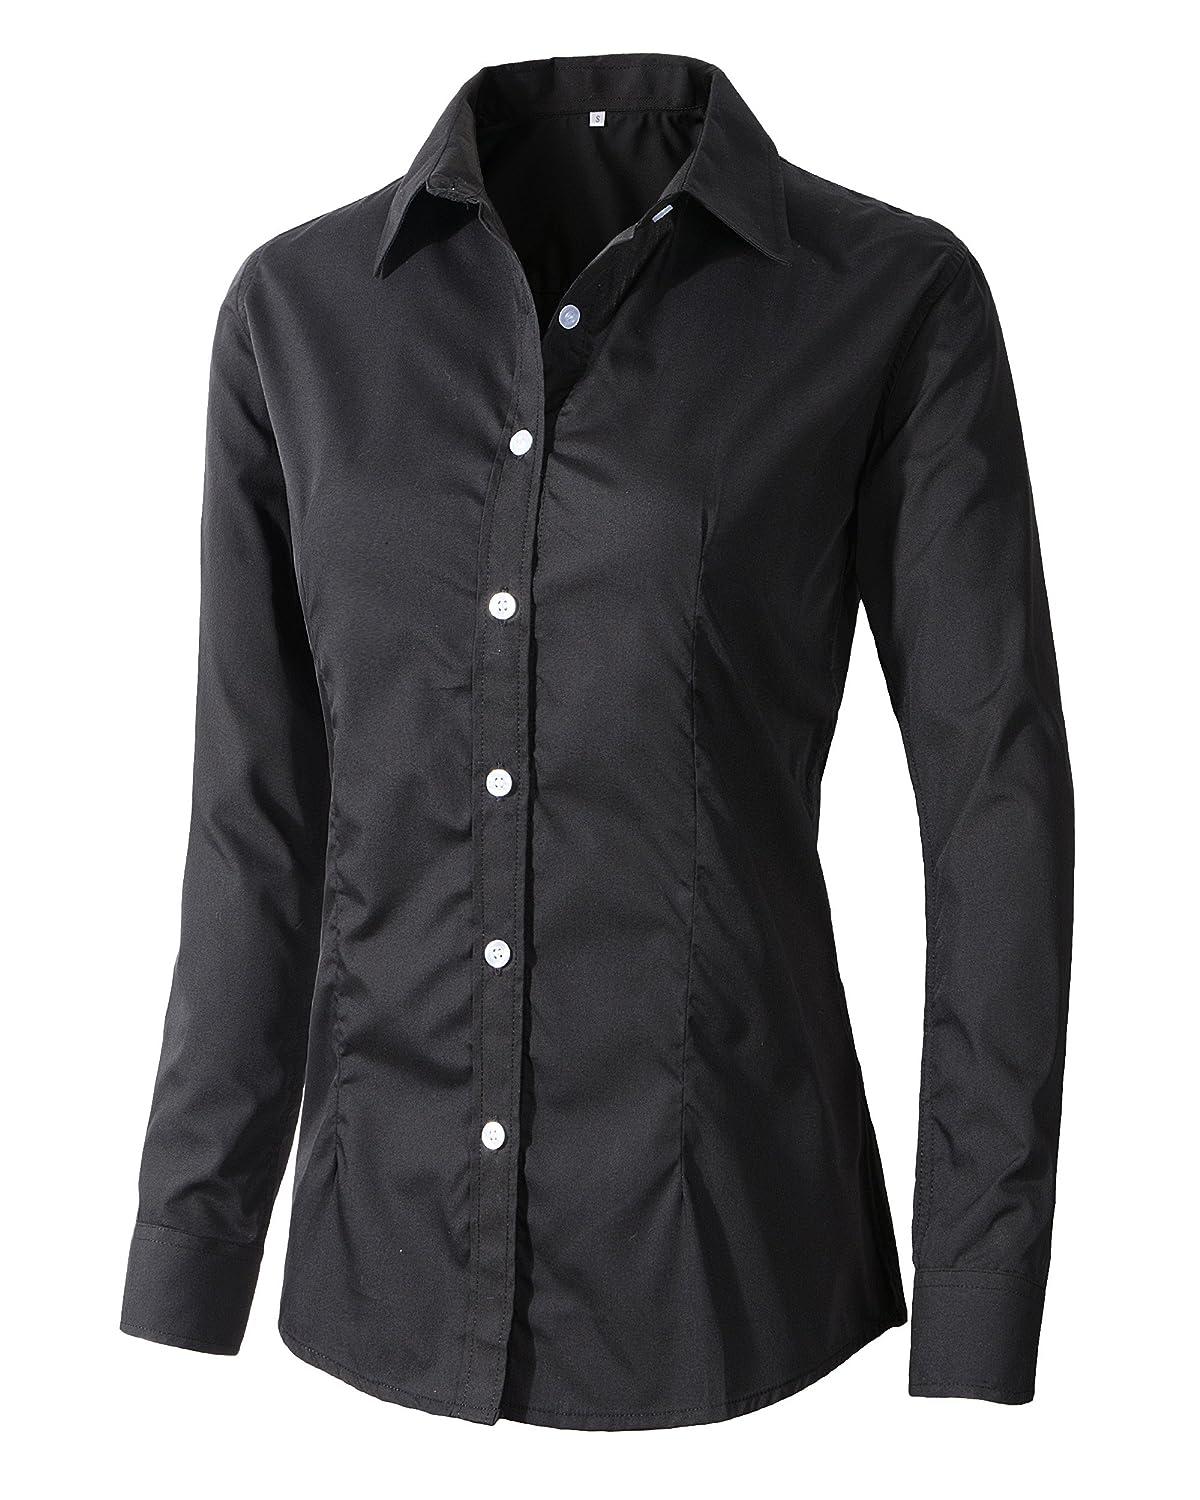 Women\'s Formal Work Wear Simple Button Down Shirt